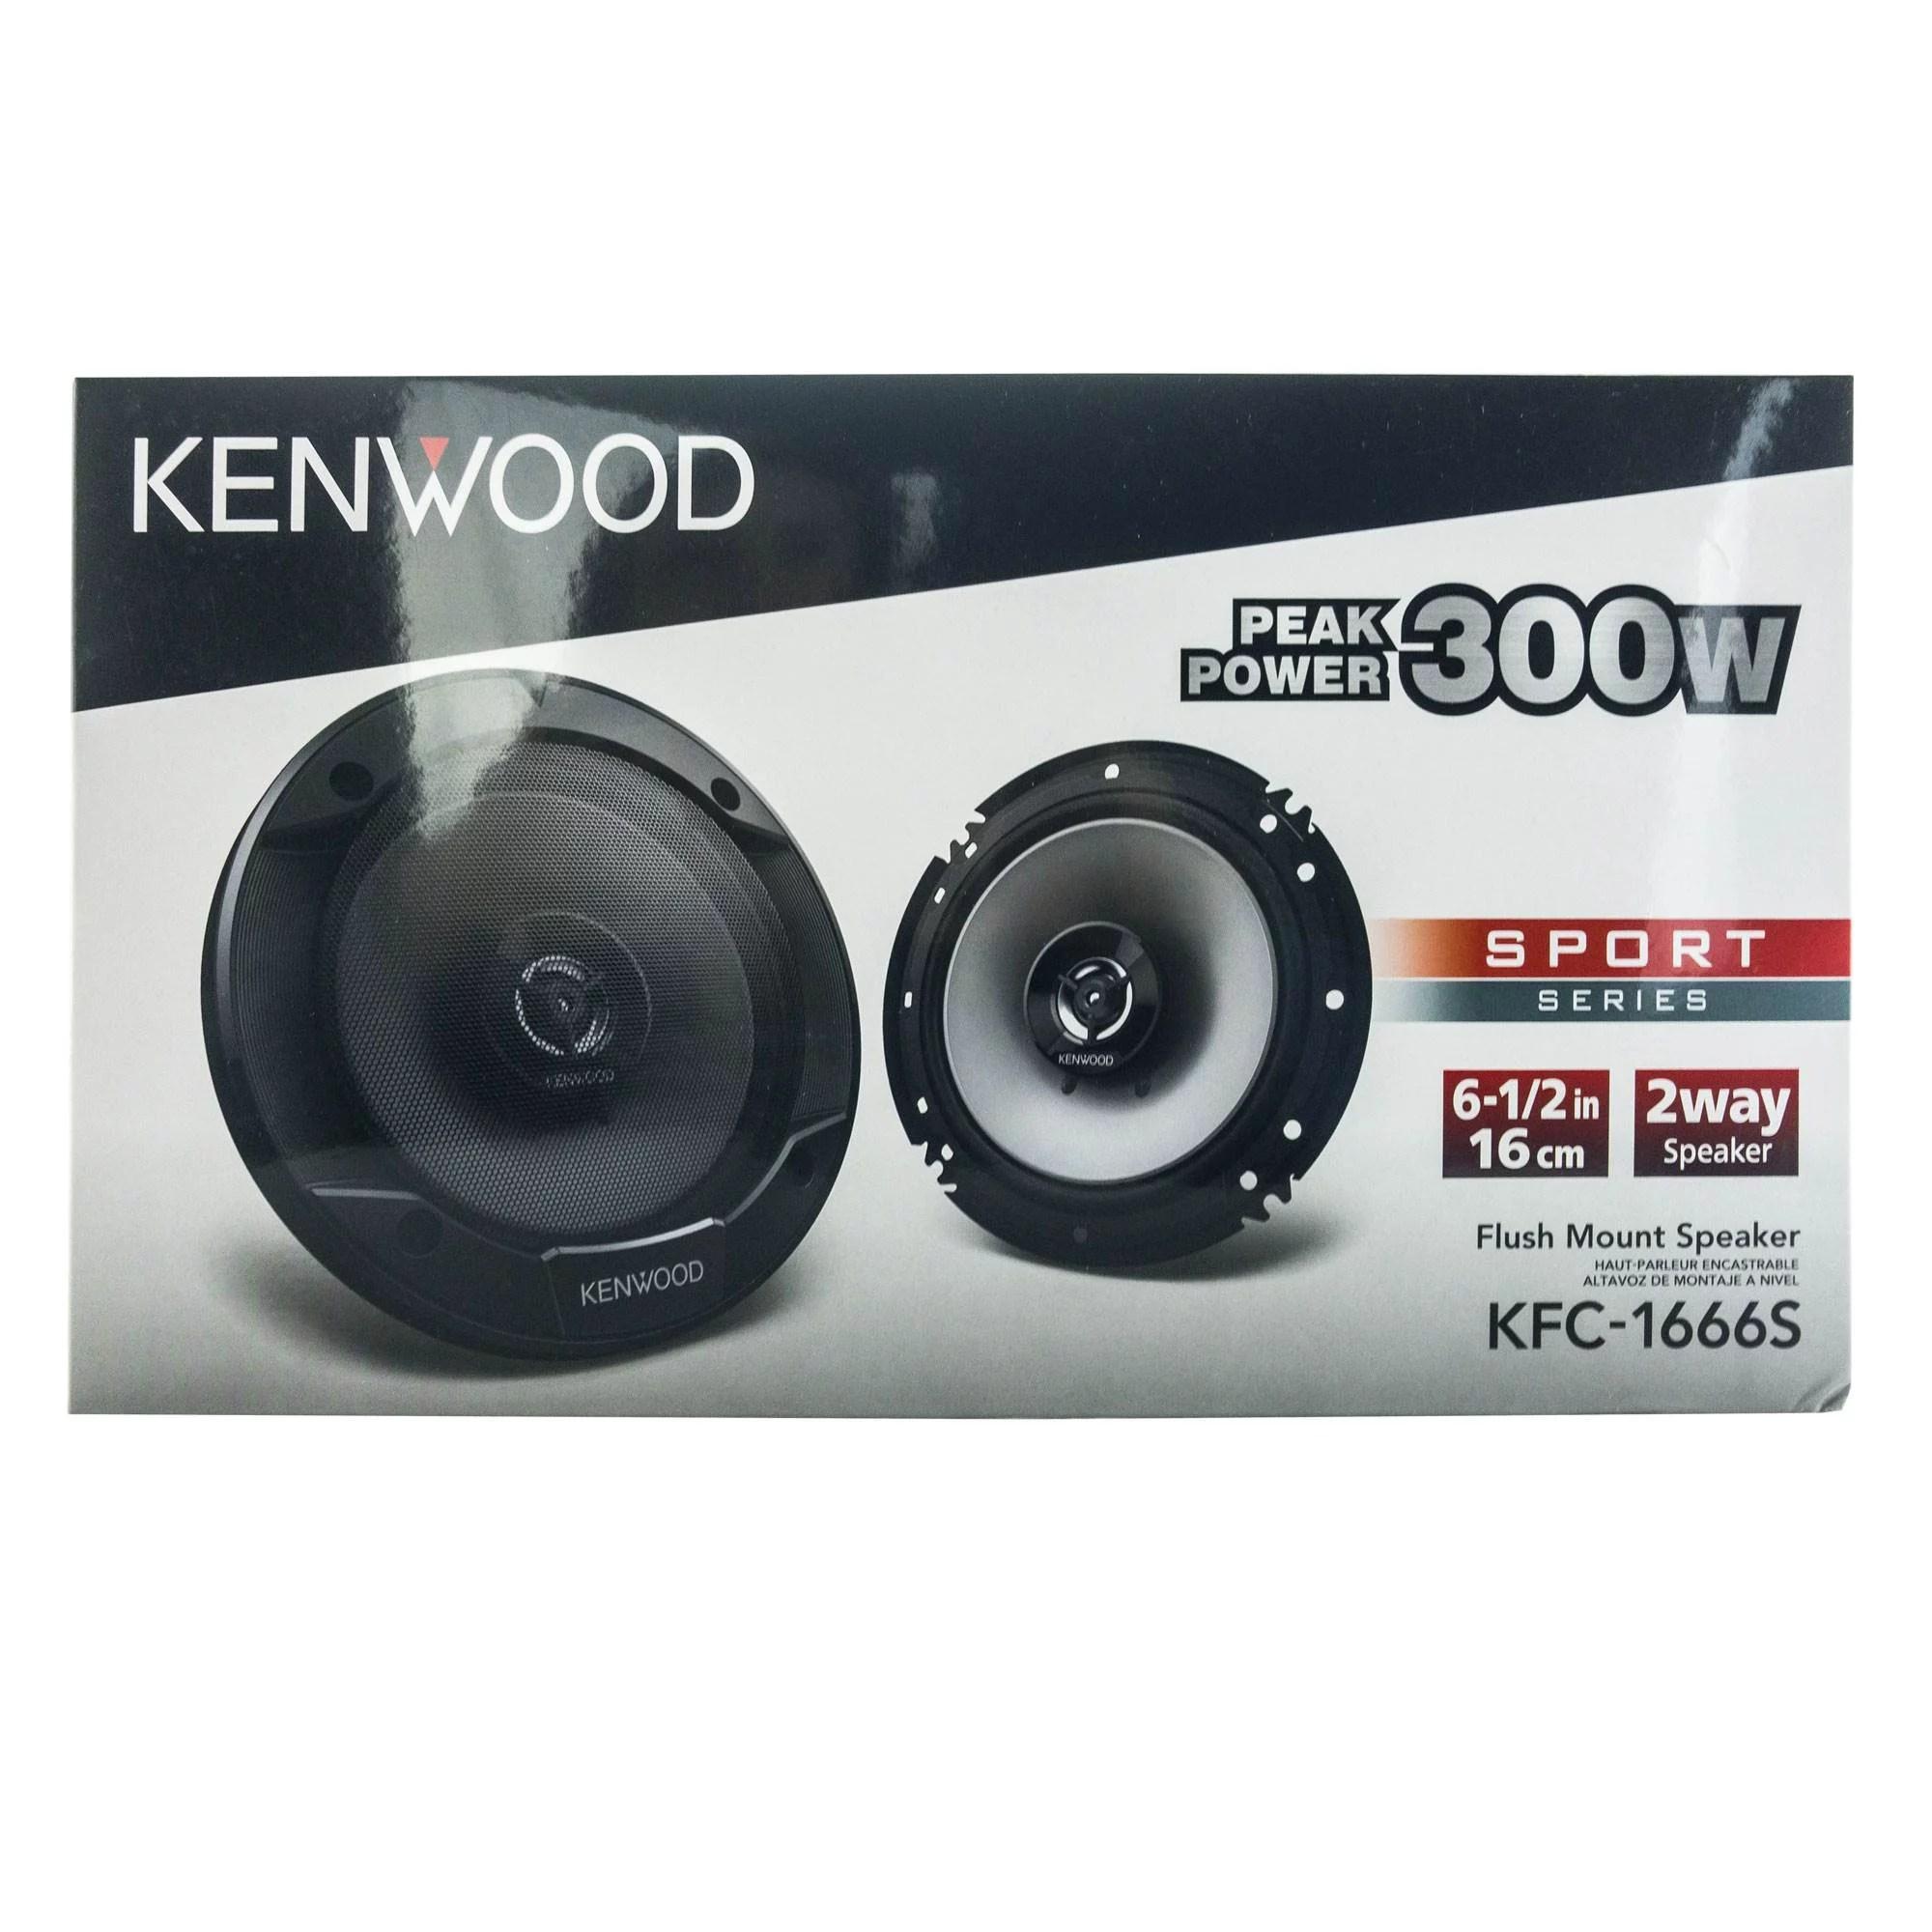 Kenwood KFC-1666S 300 Watt 6.5-Inch Coaxial 2 Way Car Audio Speaker (1 Pair)